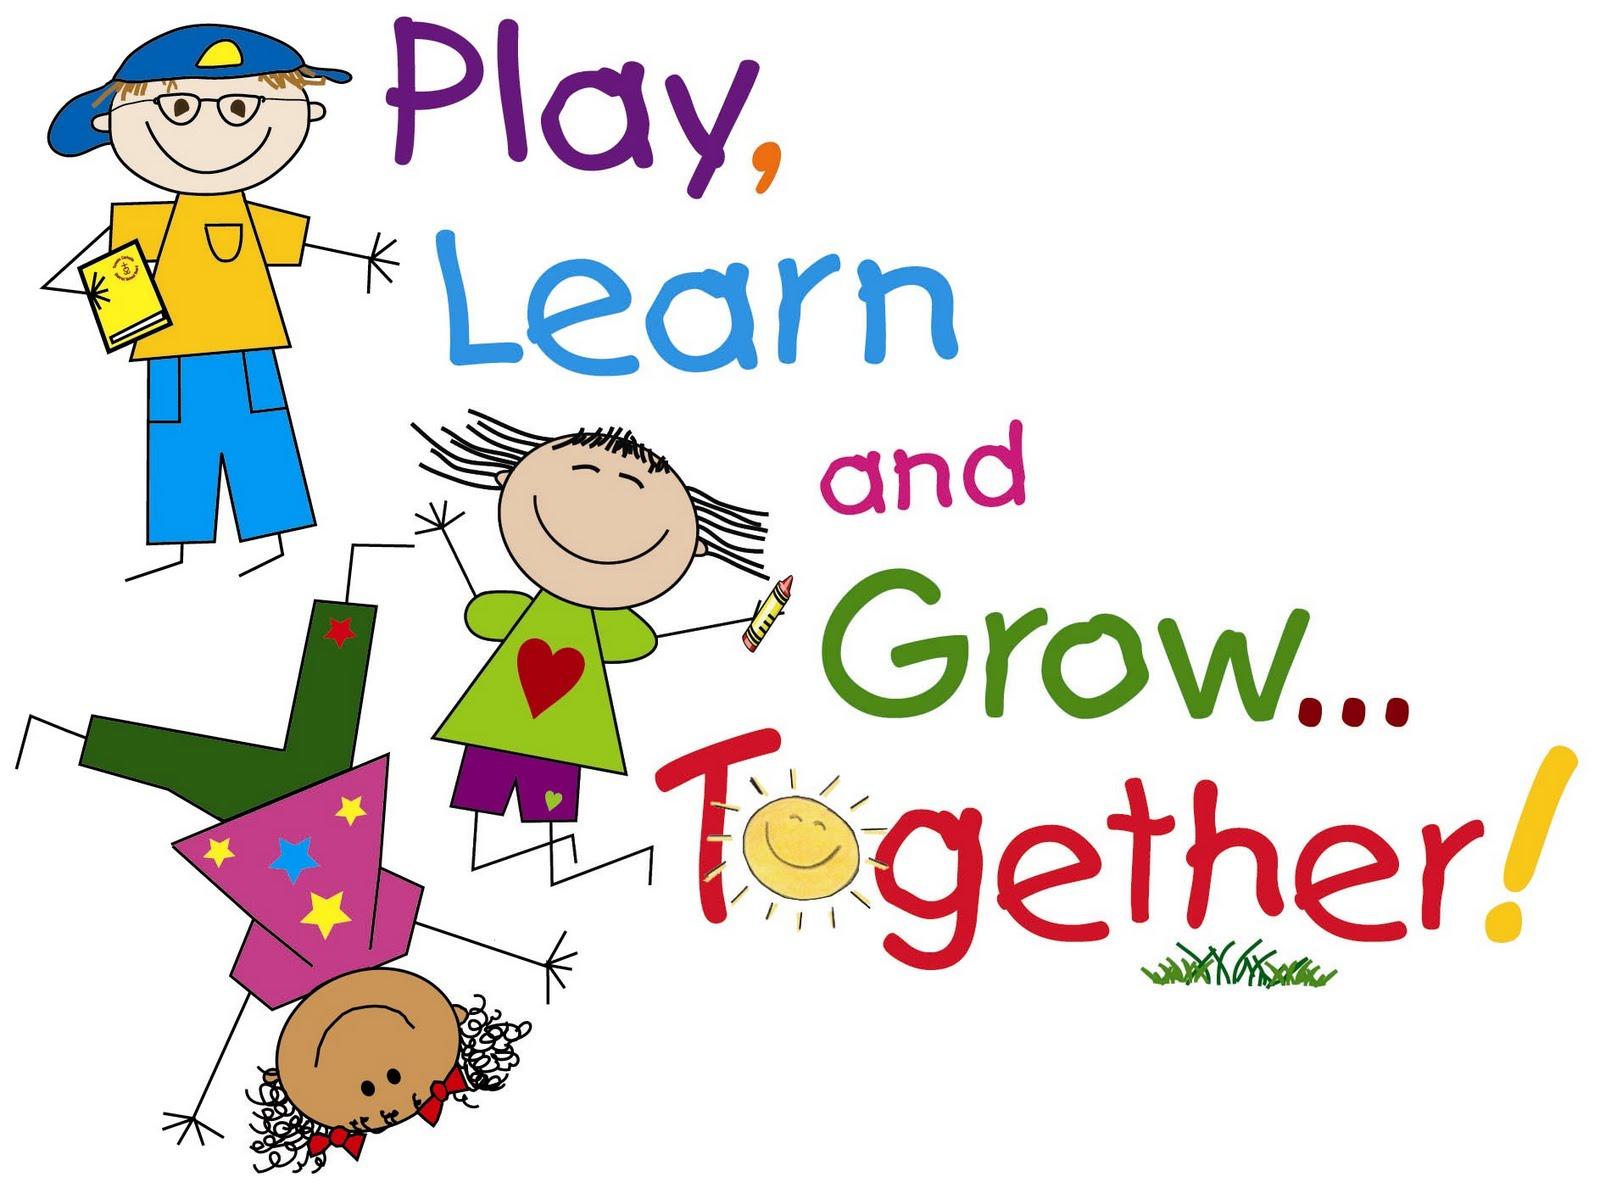 Preschool Daily Schedule Clipart Classroom Schedule Clipart